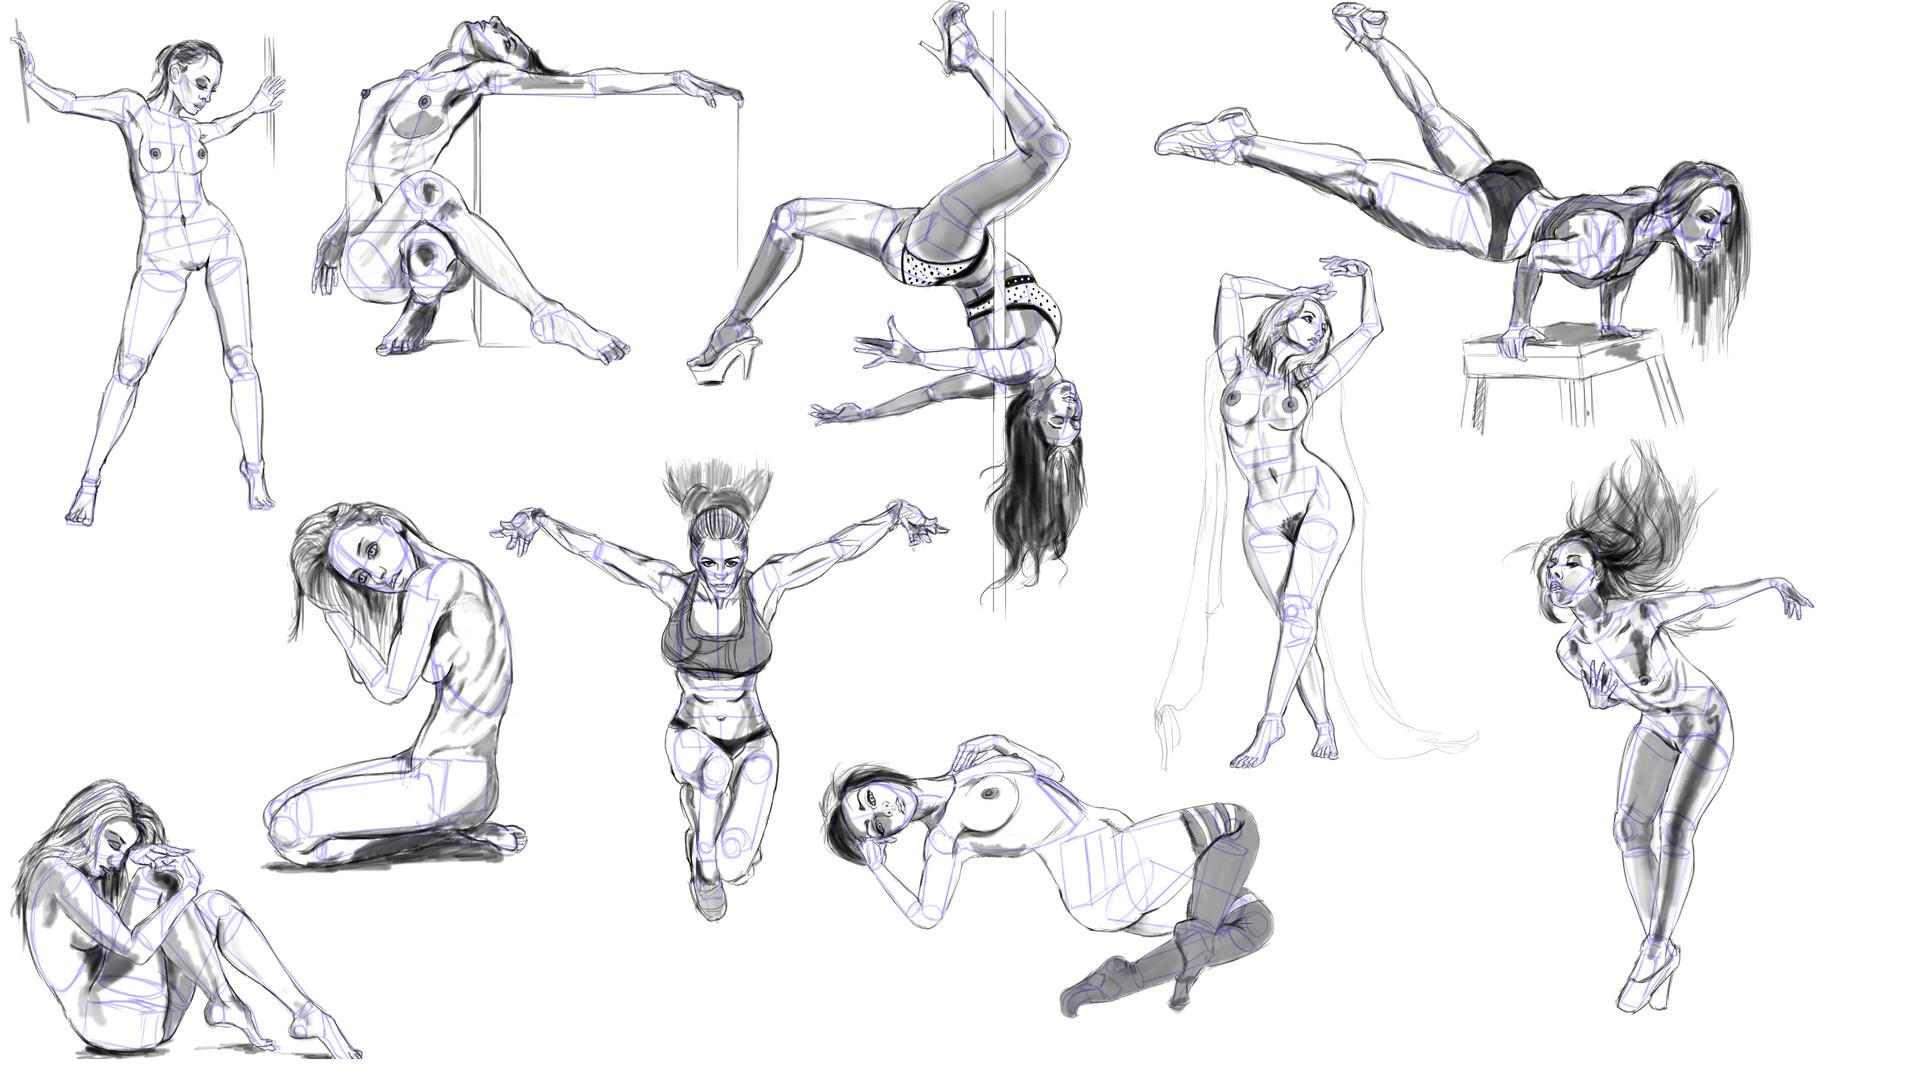 Weihan Lee - Week 4 Anatomy Basic Body Shape Studies Part II